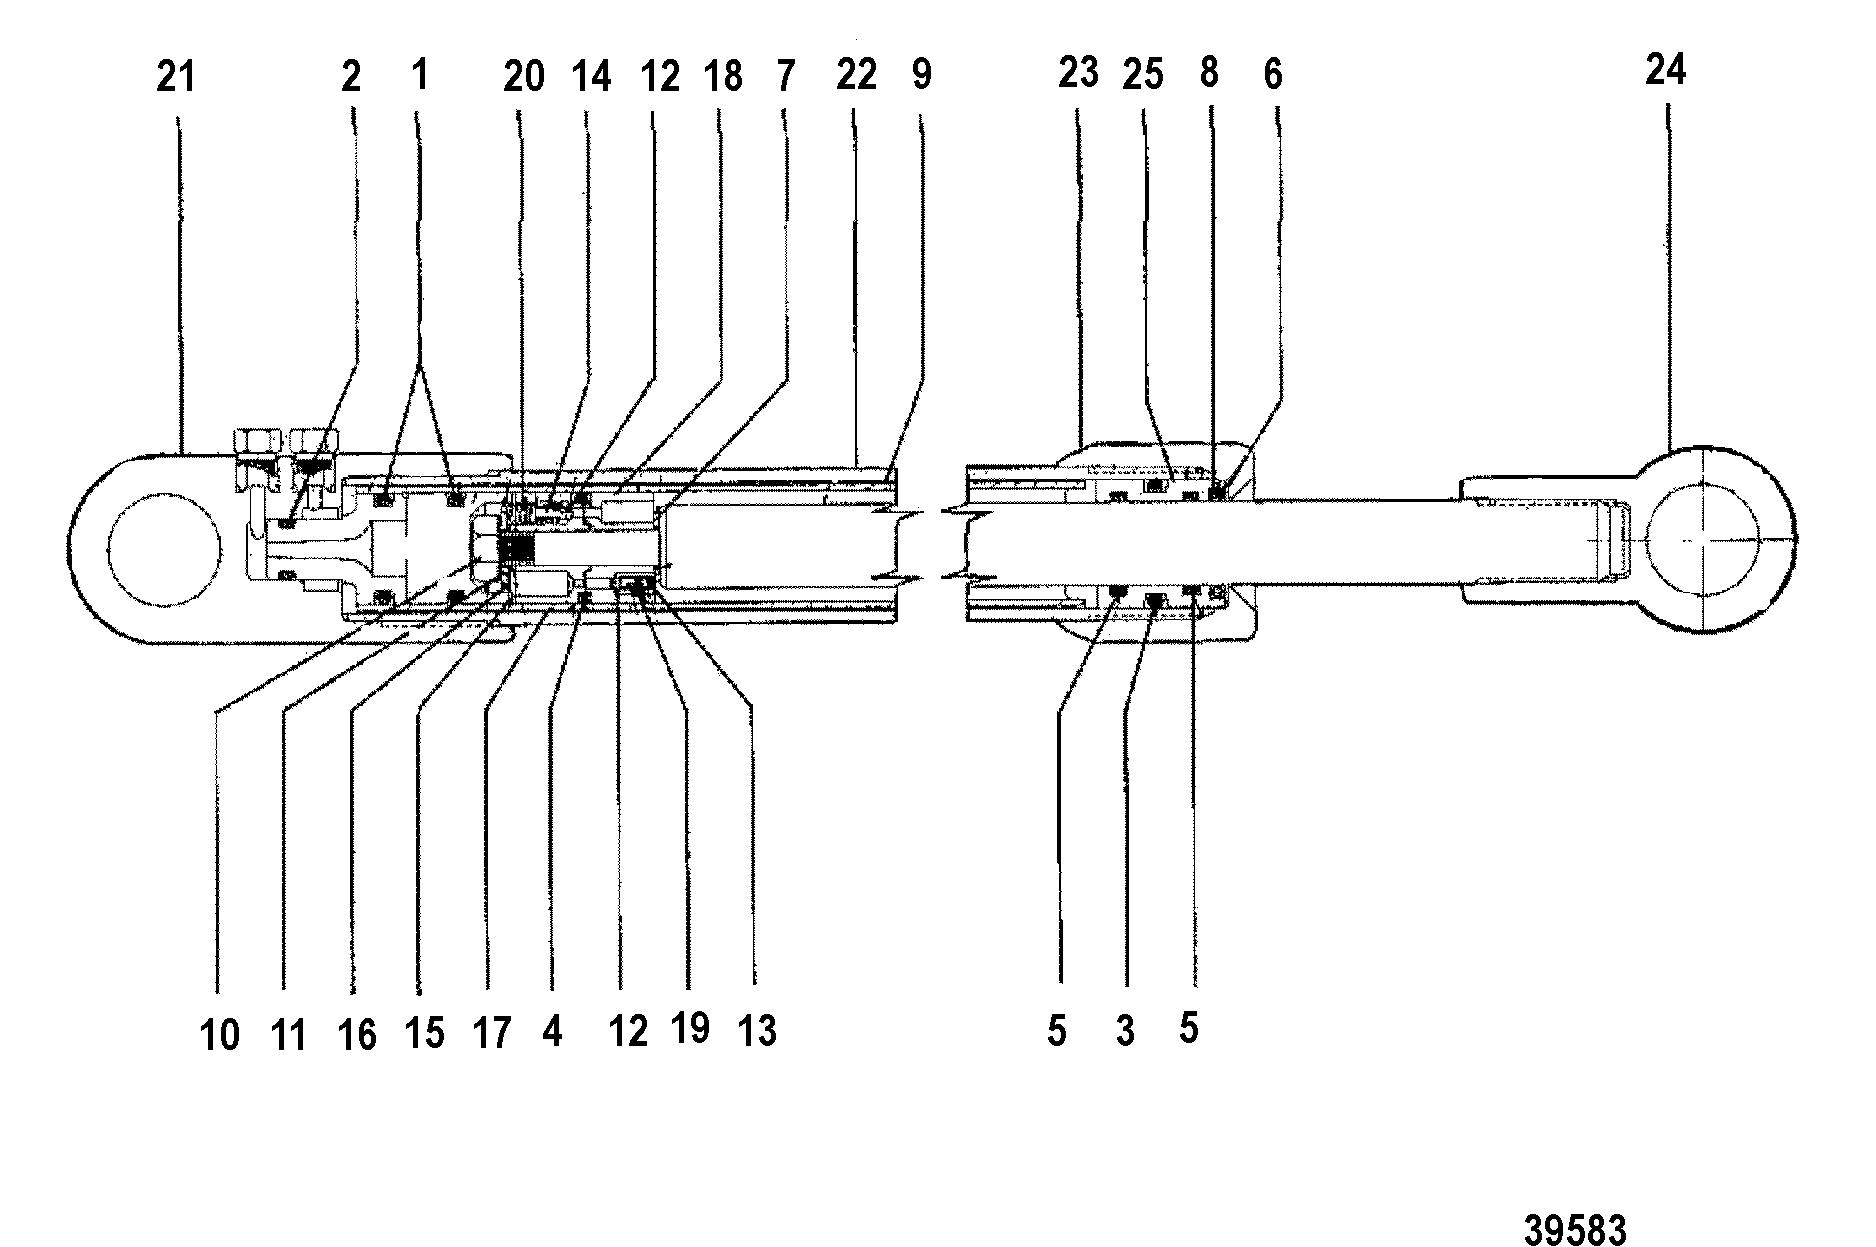 1969 john deere 140 wiring diagram hella driving lights 165 mercruiser engine